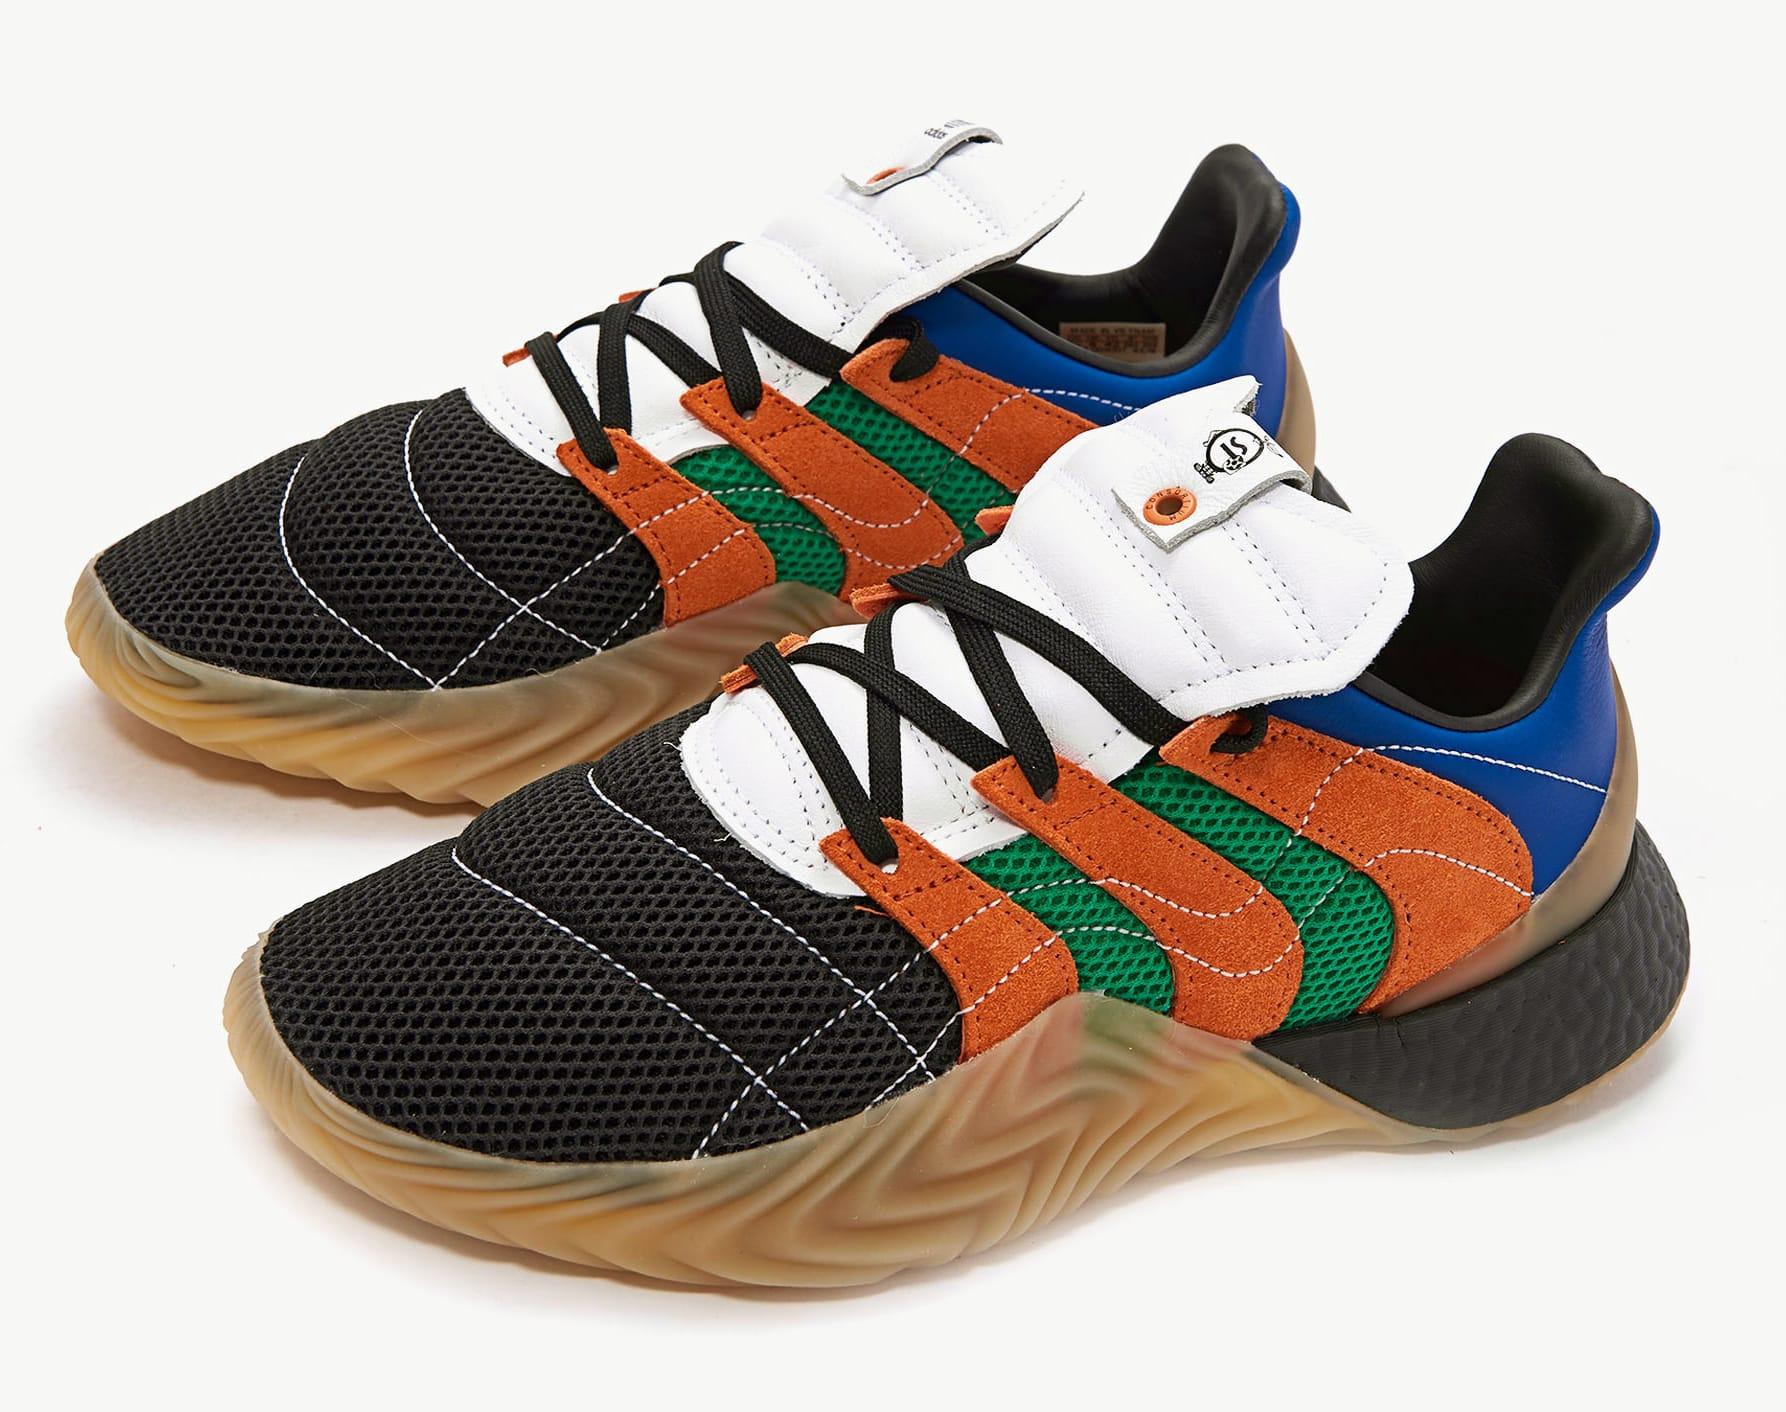 21f099a85a4f Sivasdescalzo x Adidas Consortium Sobakov Boost  1982 World Cup ...